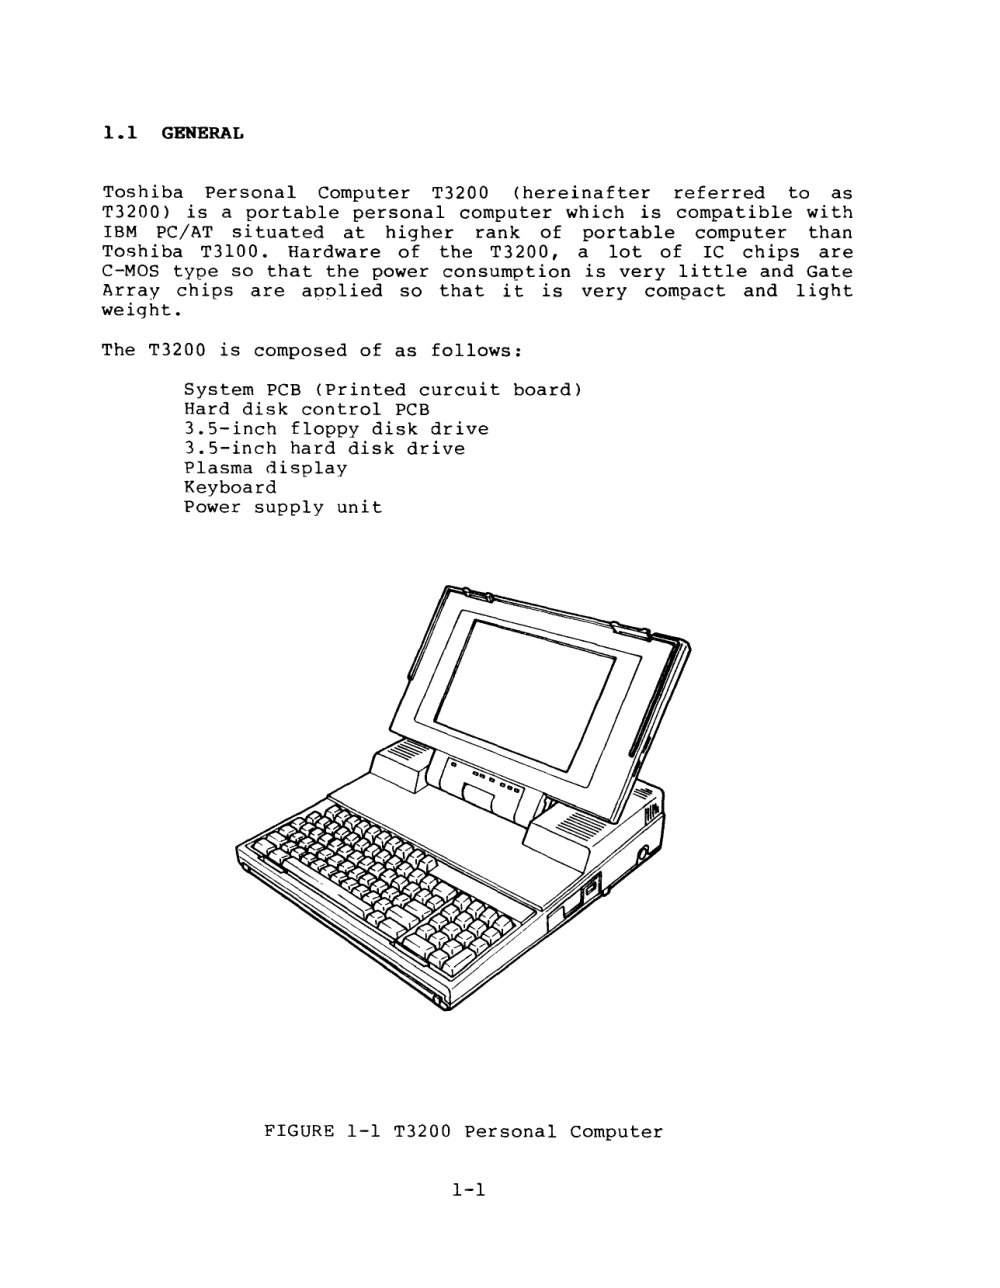 medium resolution of toshiba t3200 maintenance manual